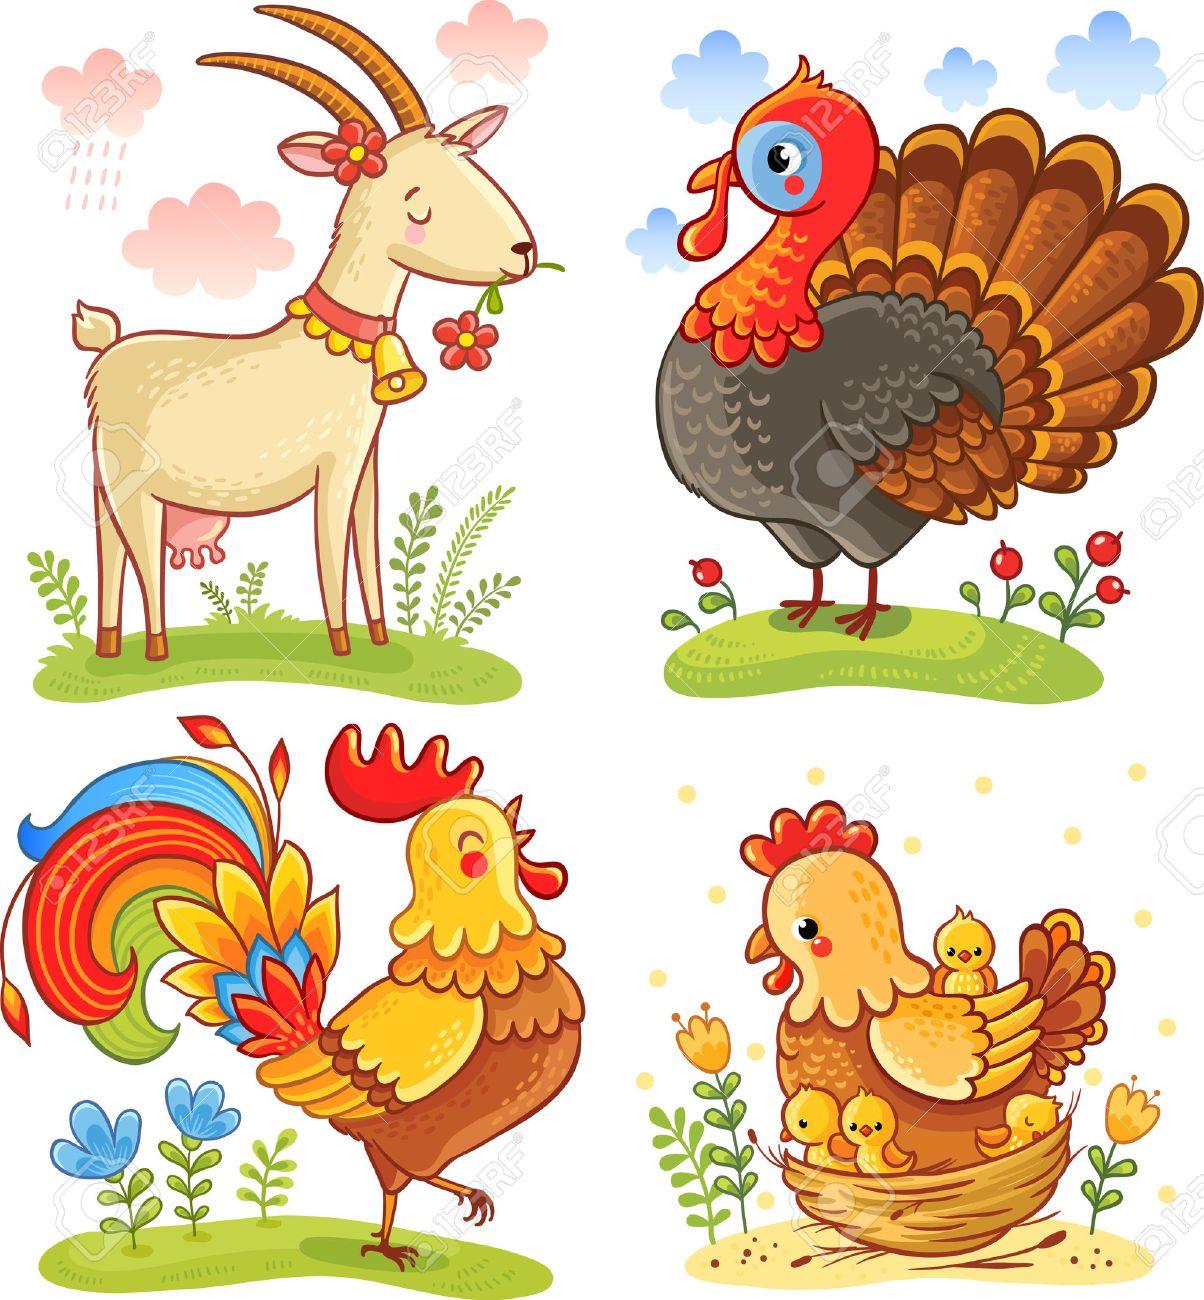 Vector set illustration with cute cartoon animal. - 53803525